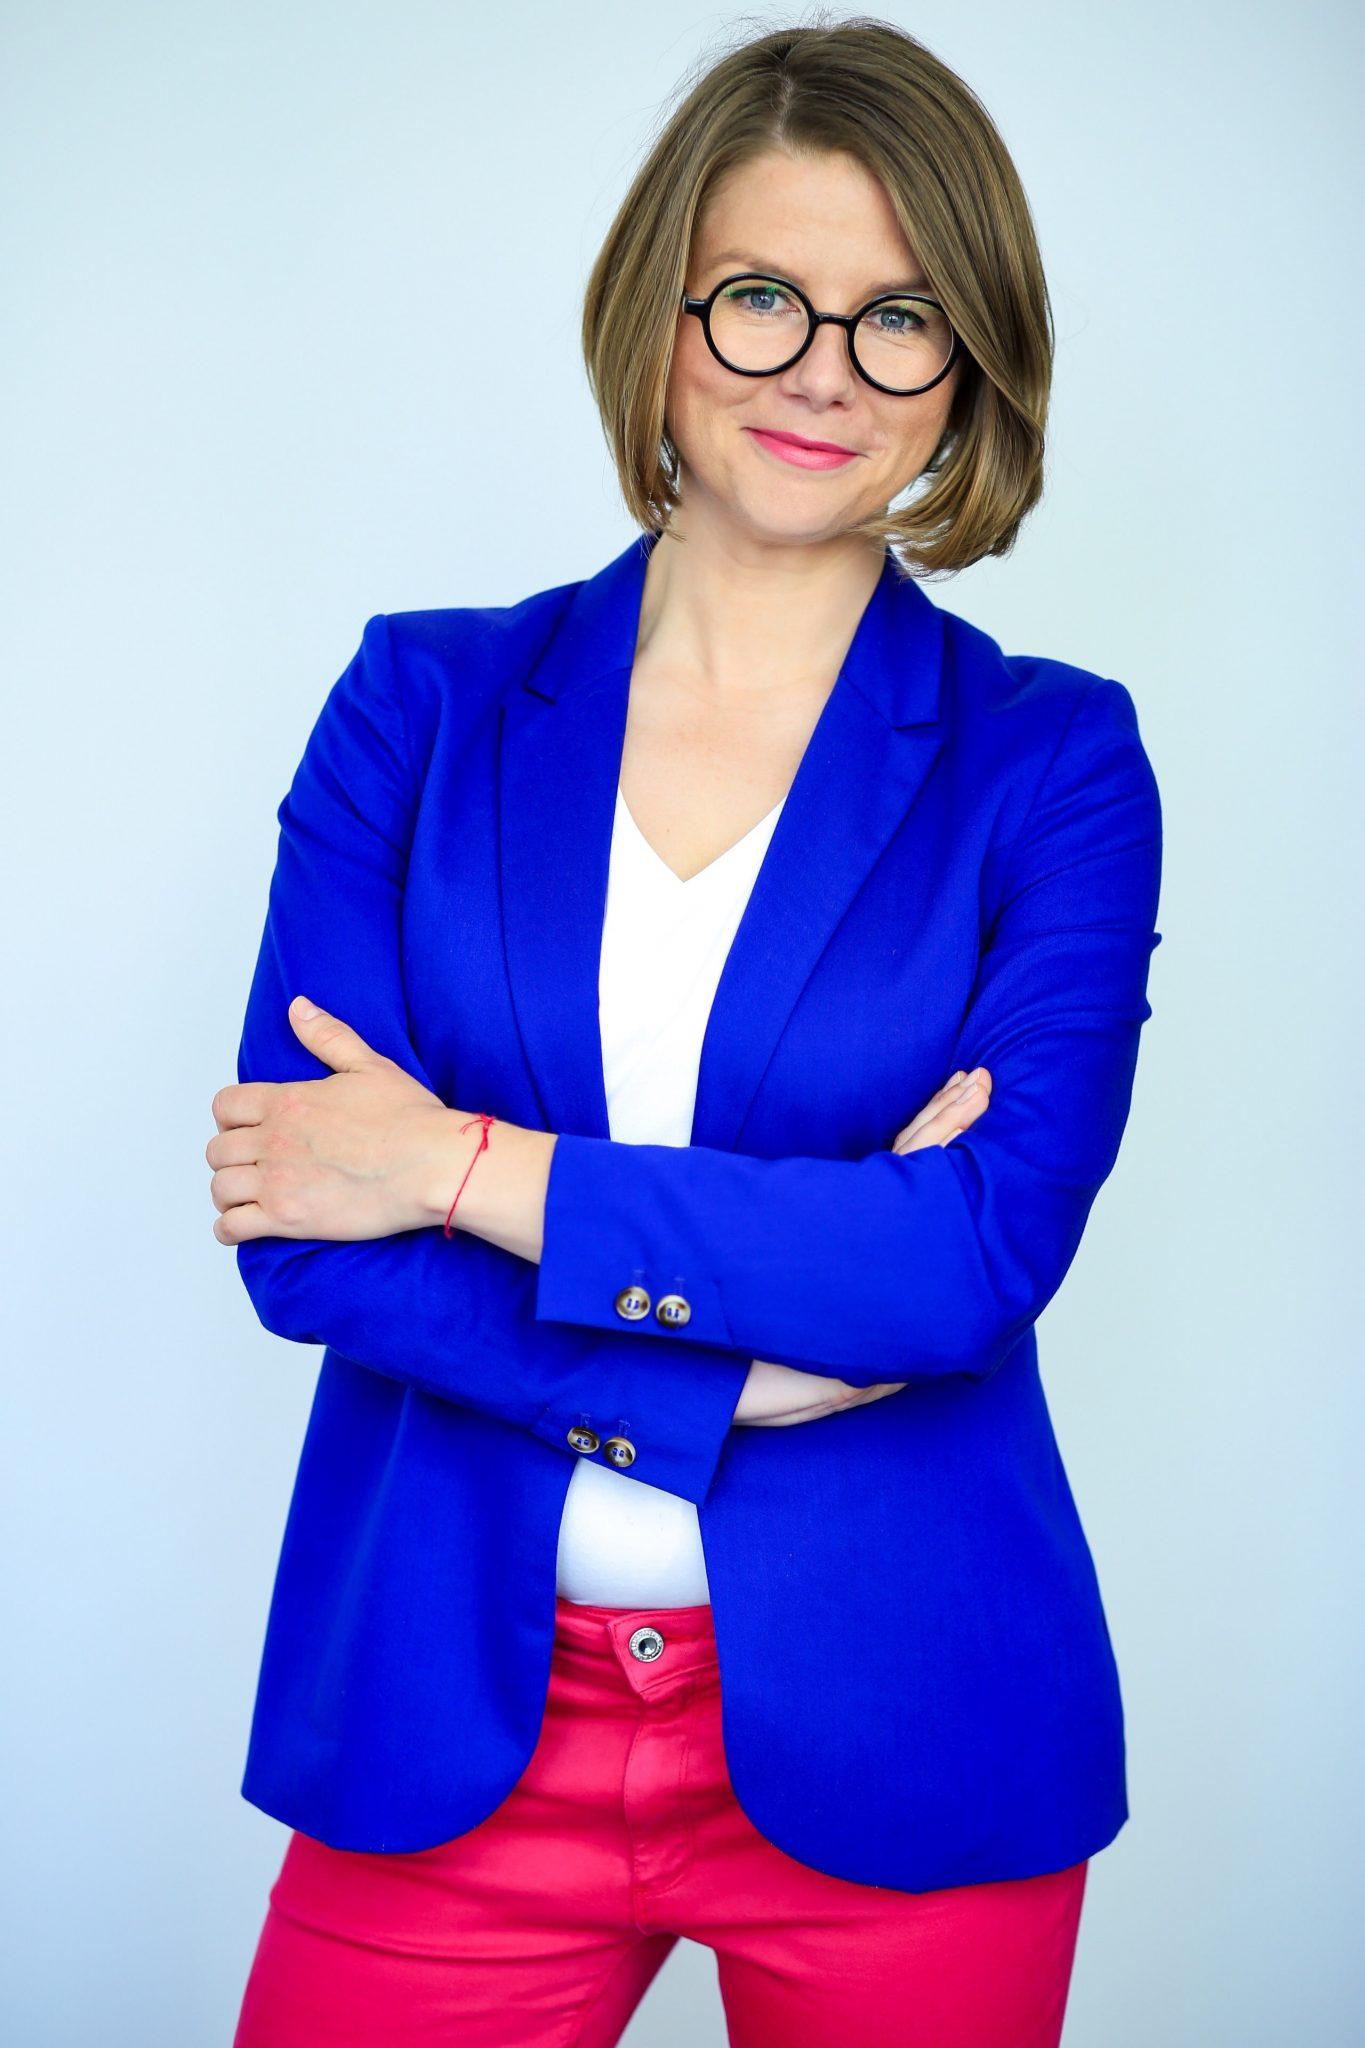 Monika Paliwoda